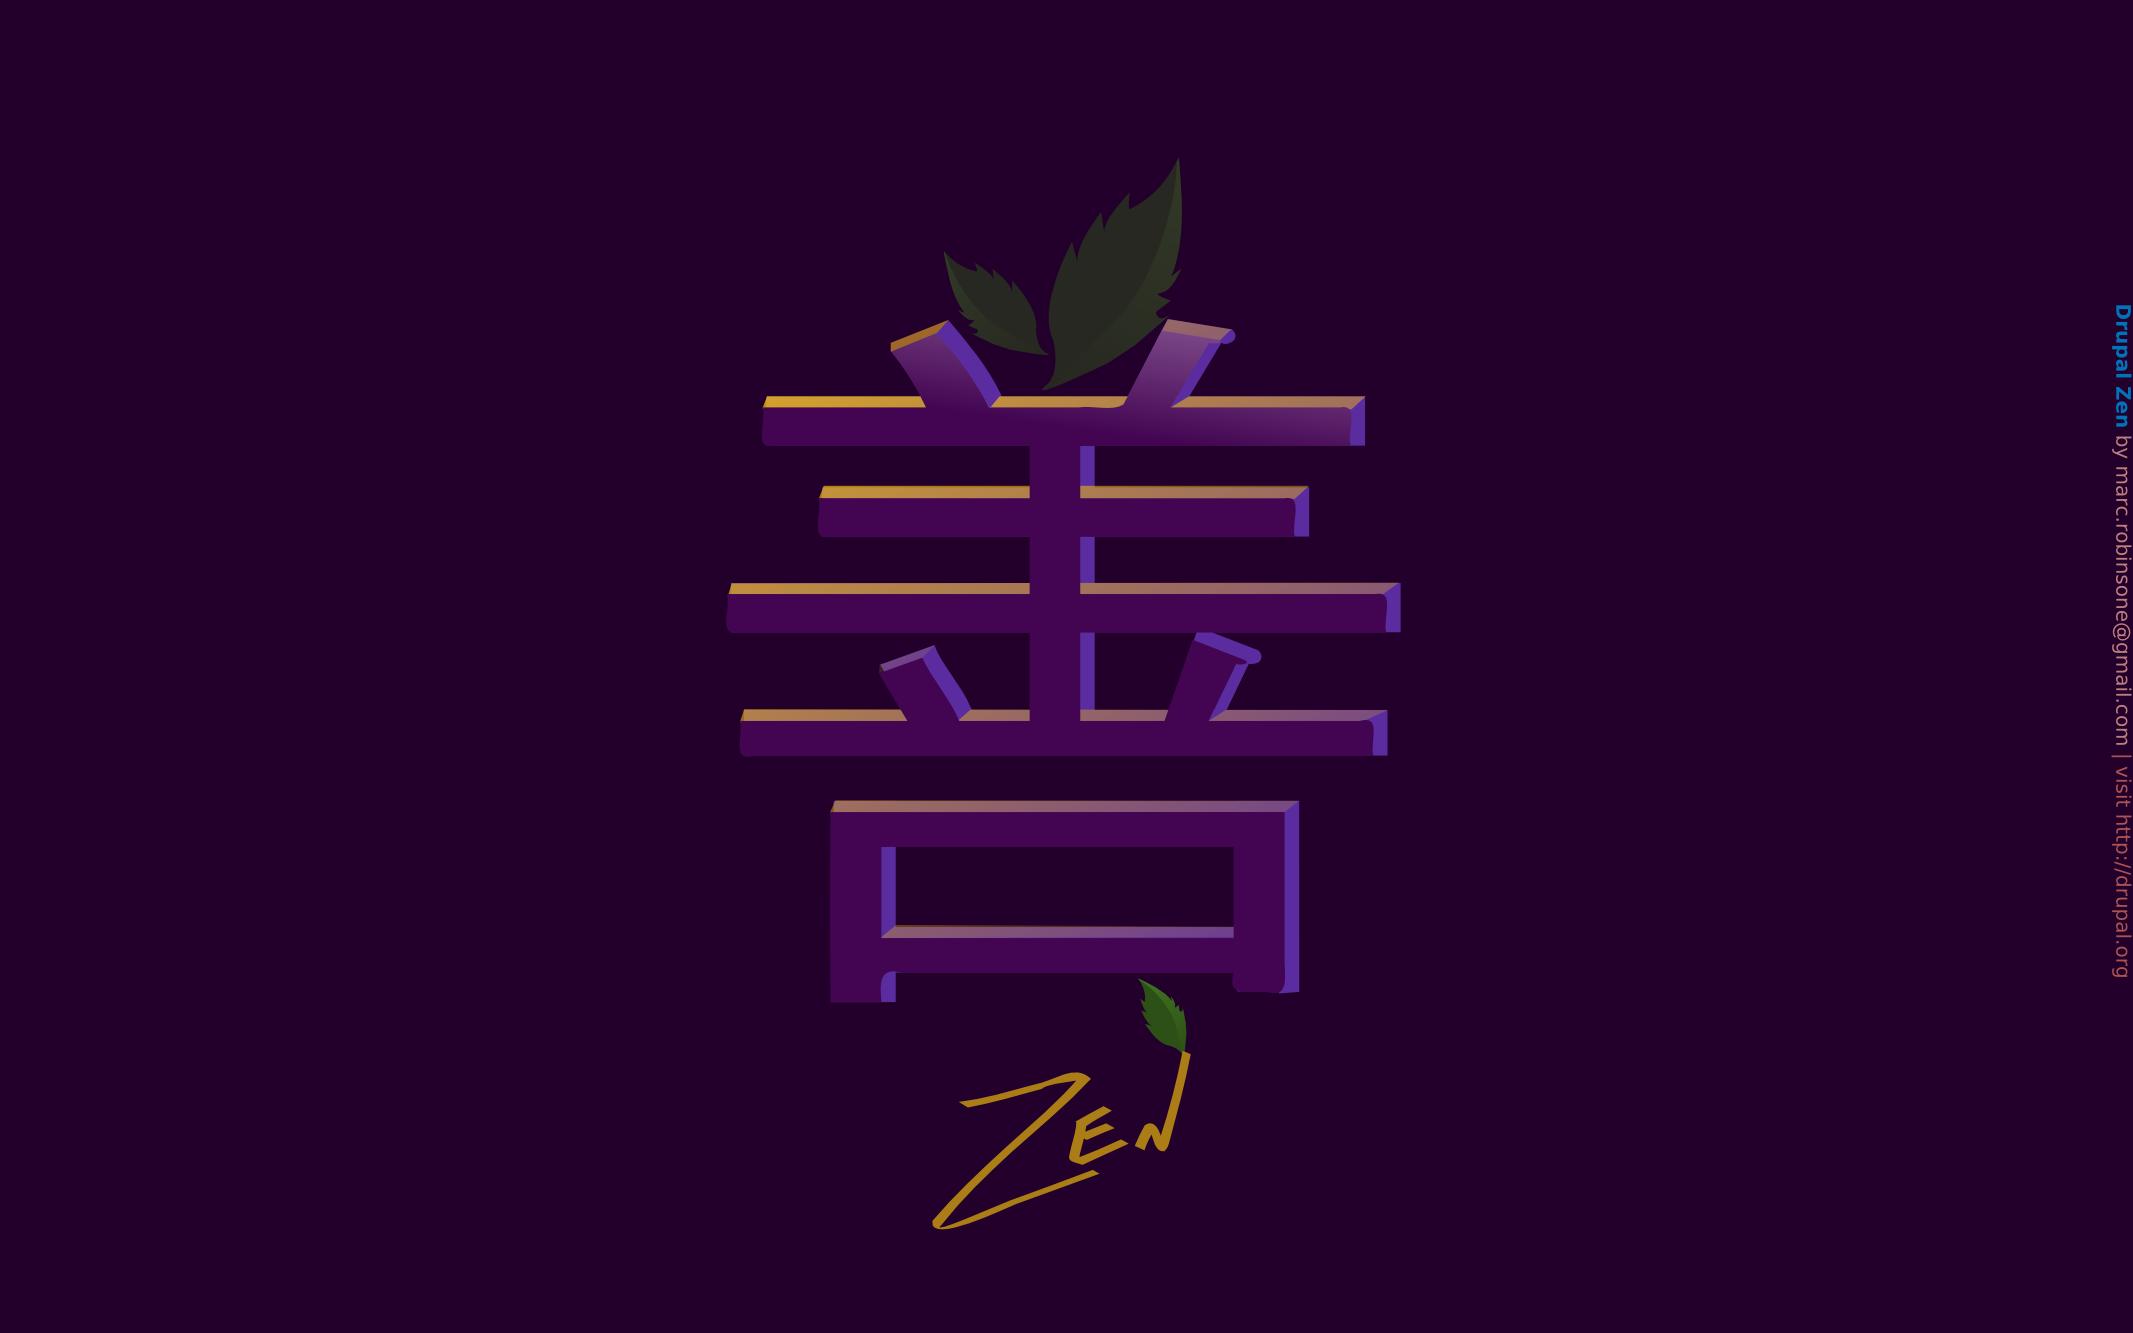 Drupal Zen Wallpaper   Drupal Groups